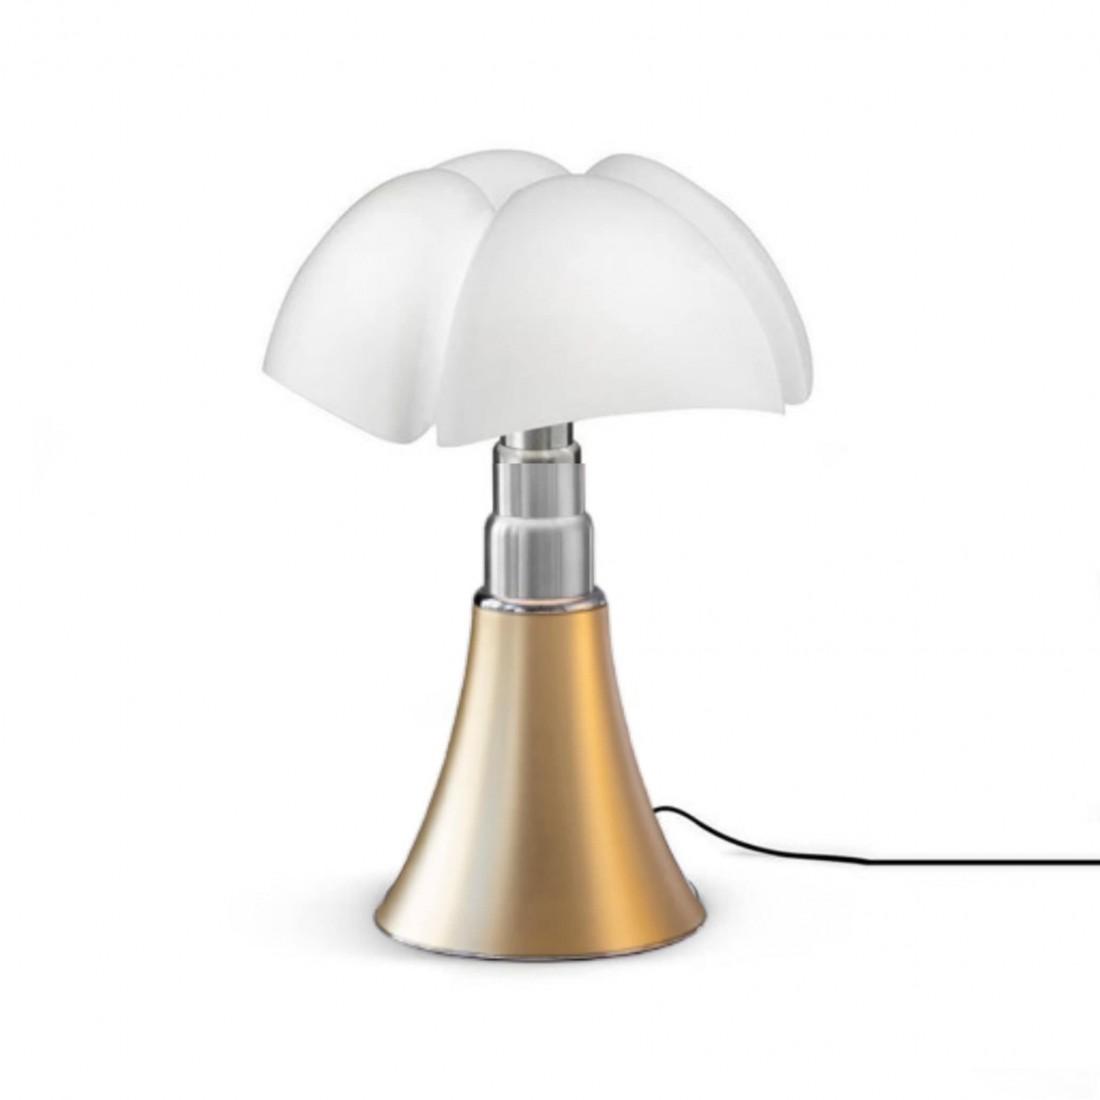 Grande Lampe Pipistrello Laiton Satiné H66-86cm